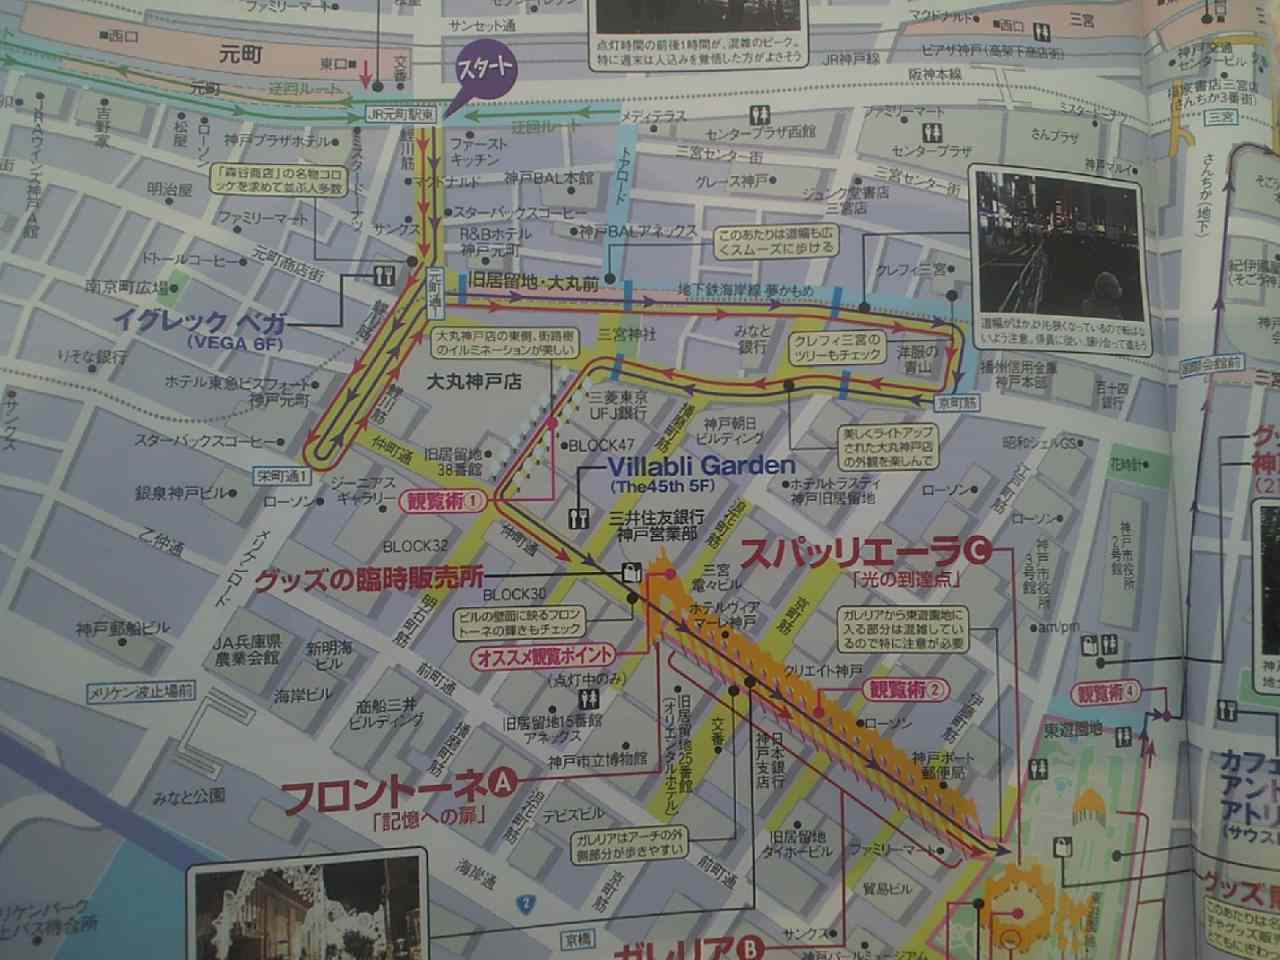 163720131_org.jpg